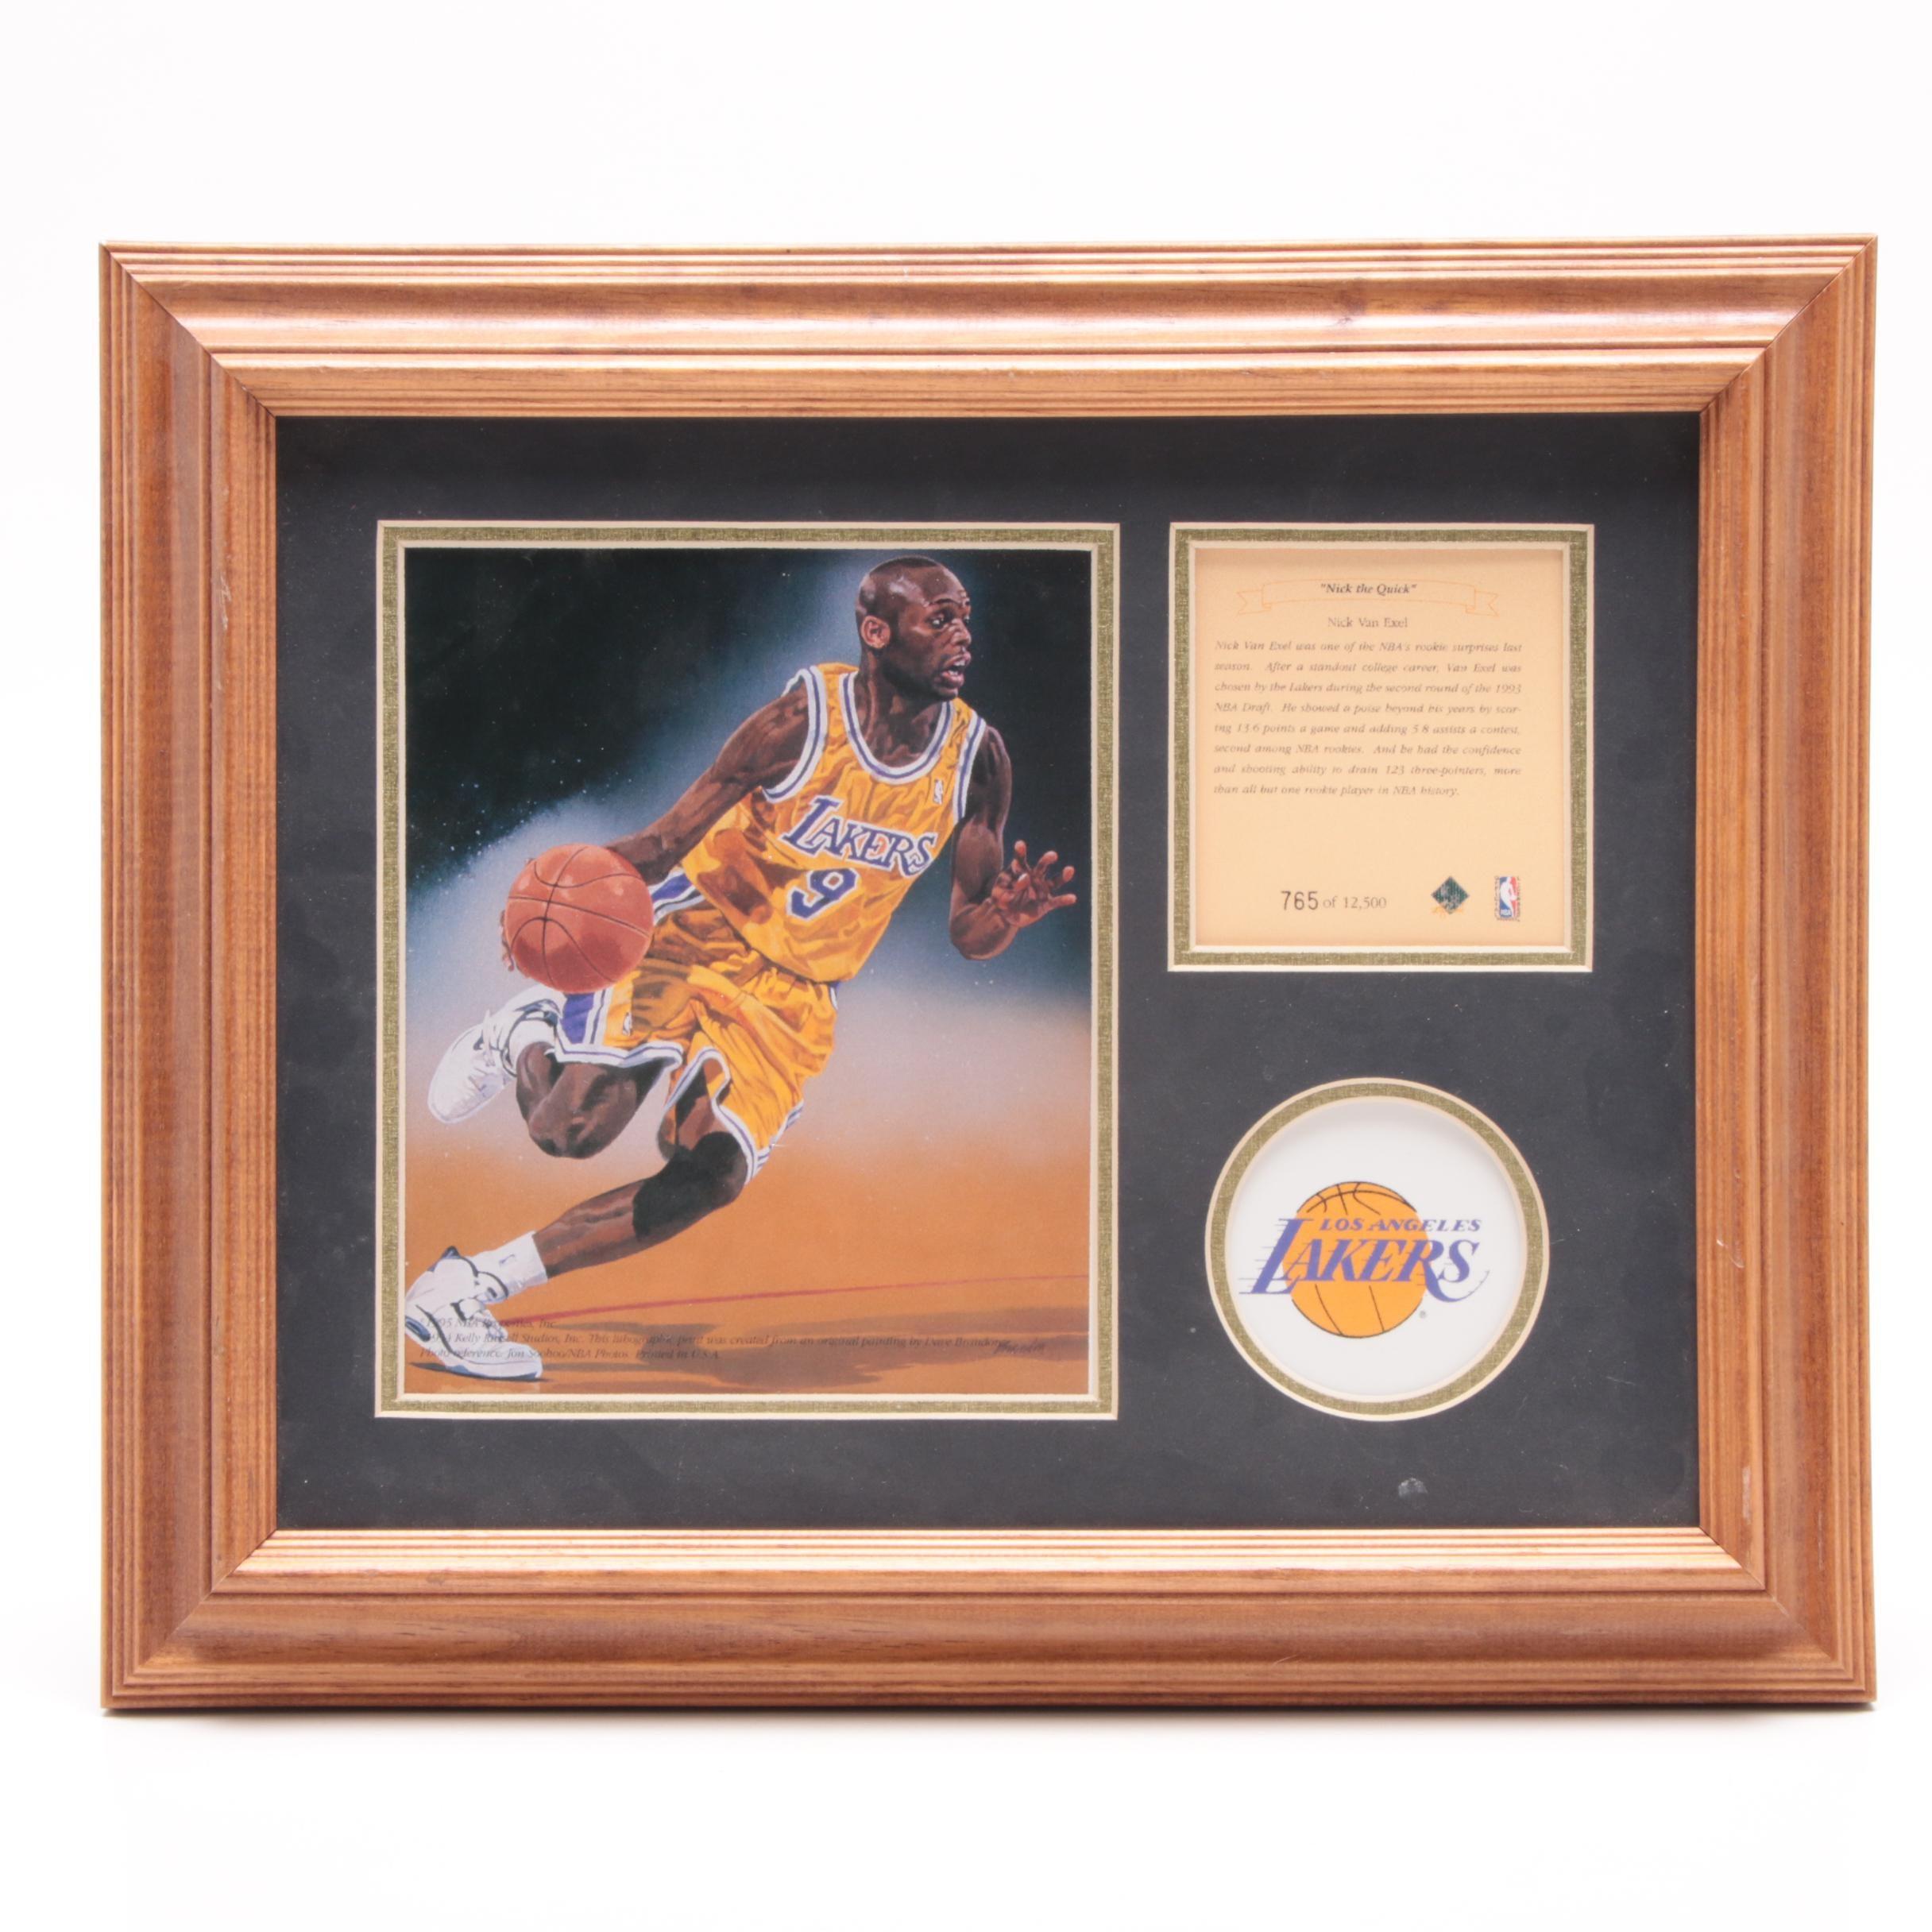 1995 Nick Van Exel Los Angeles Lakers Limited Edition Framed Basketball Display